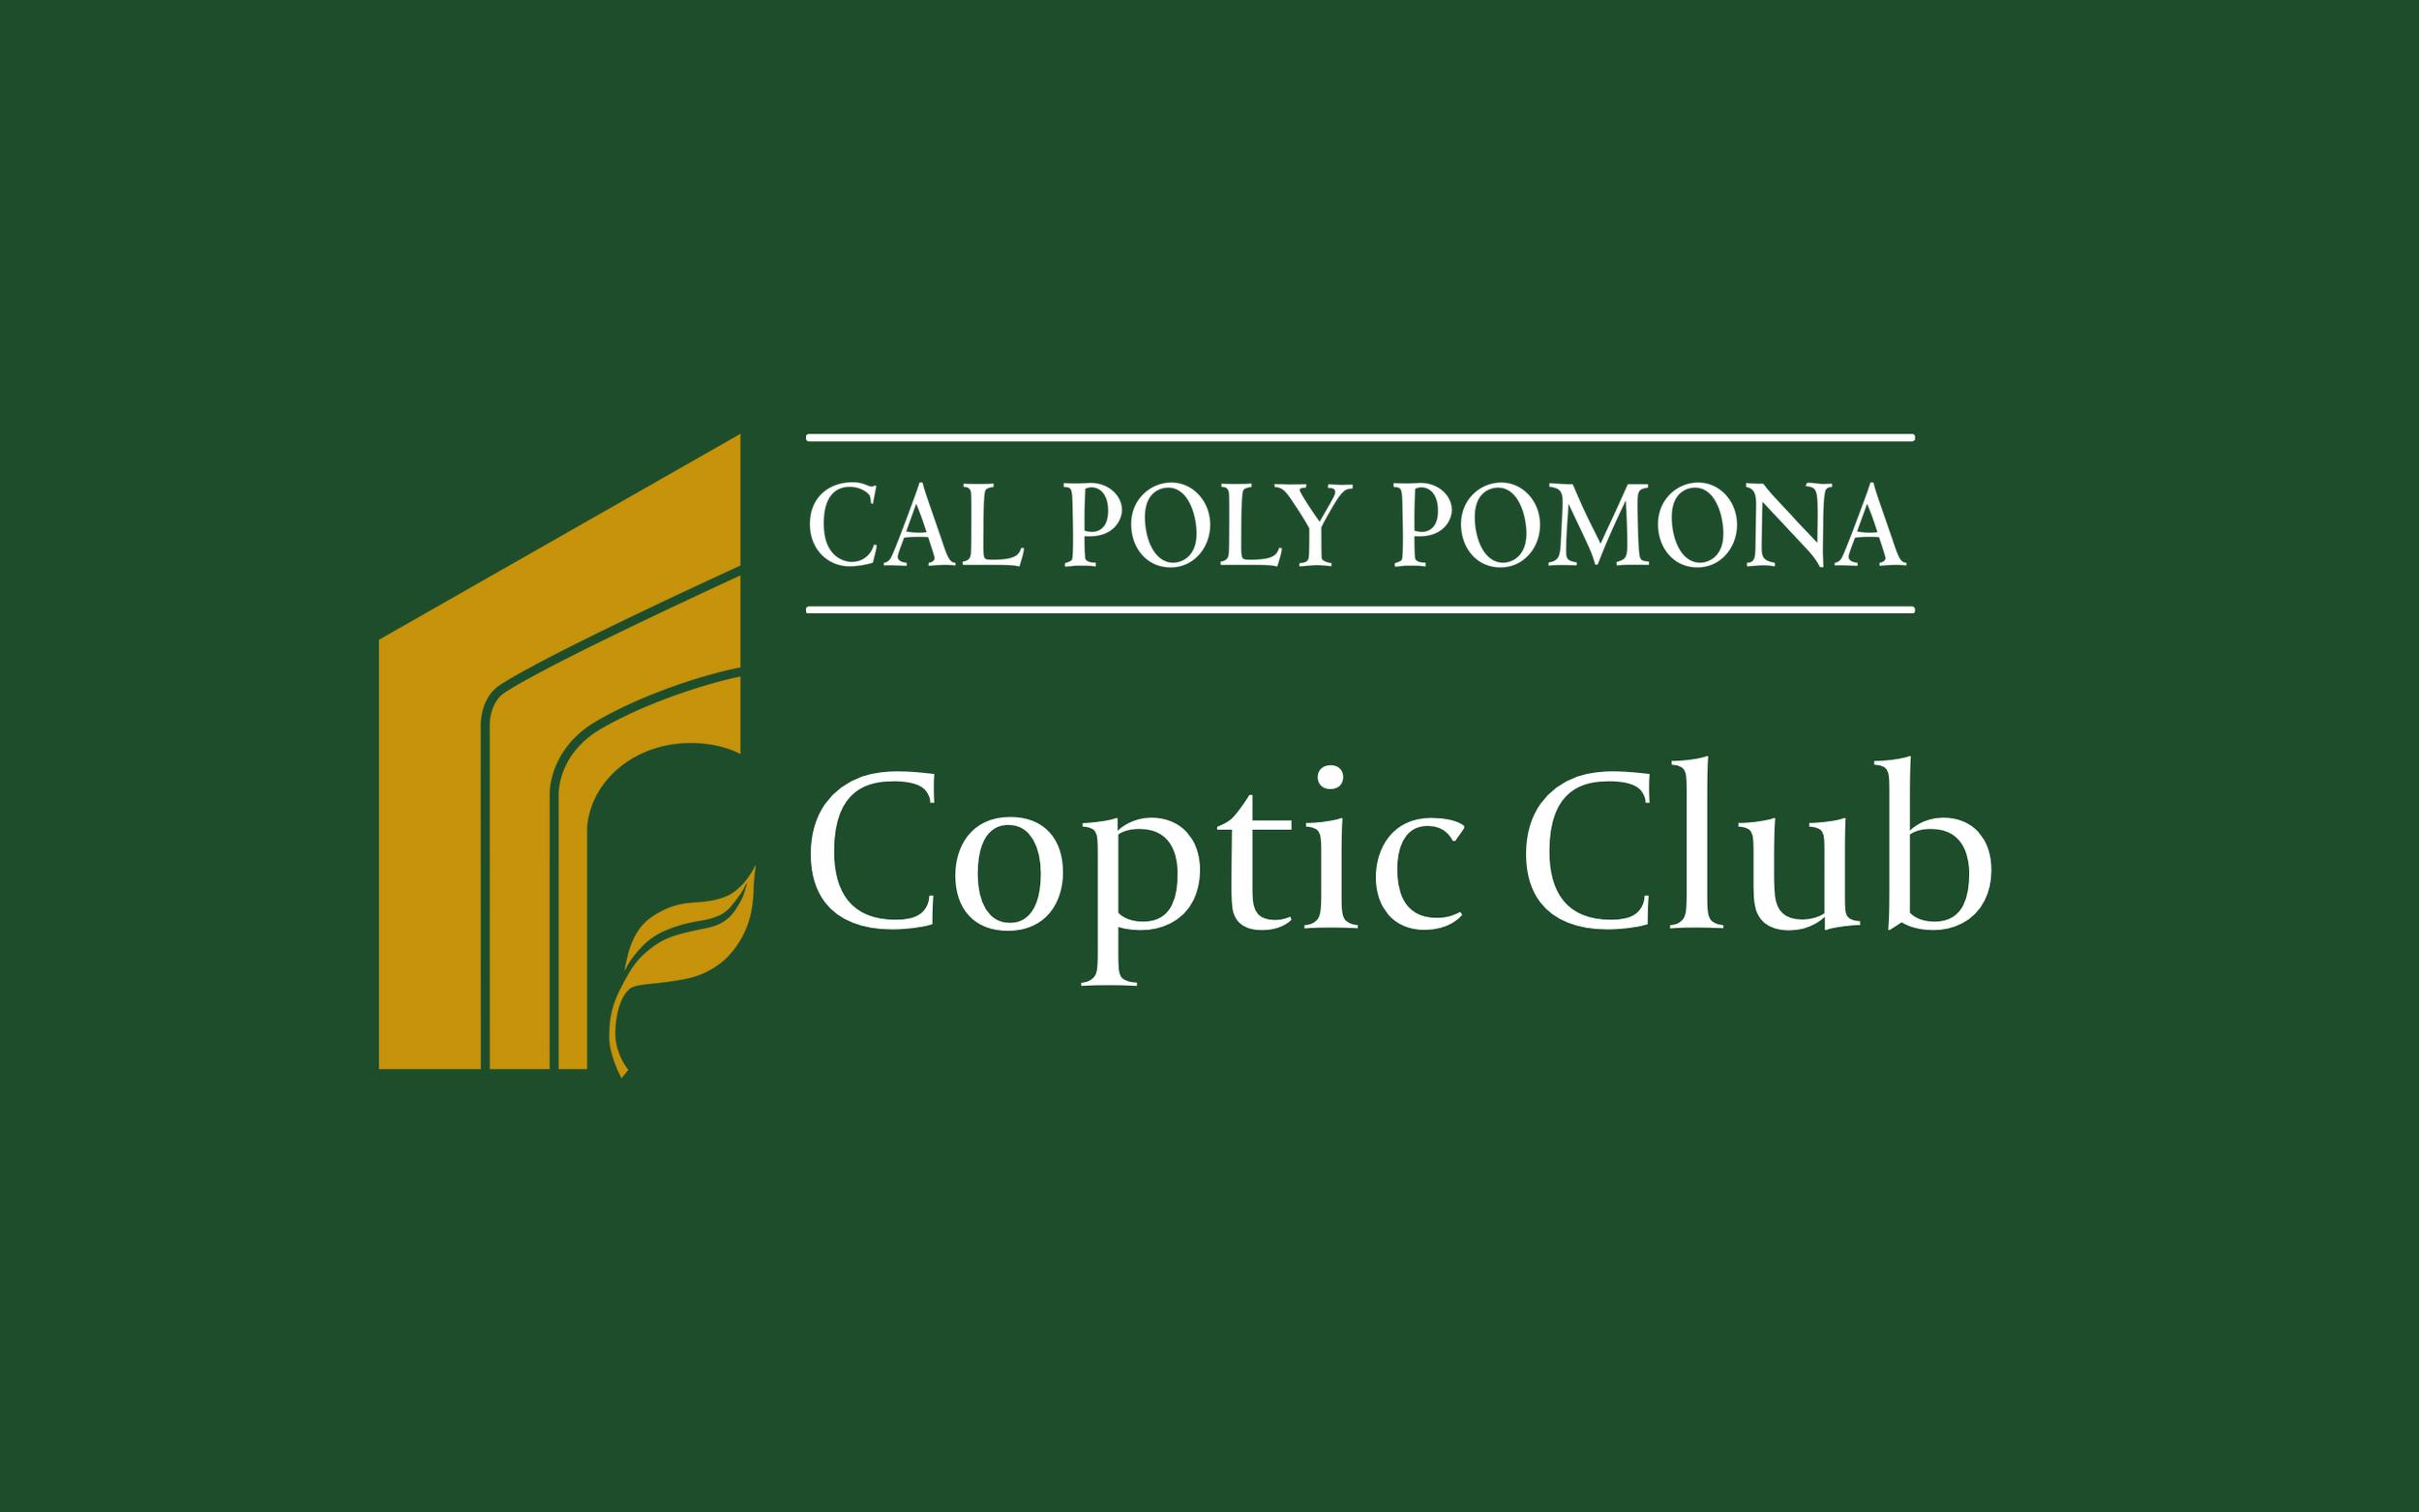 CPP Coptic Club.png